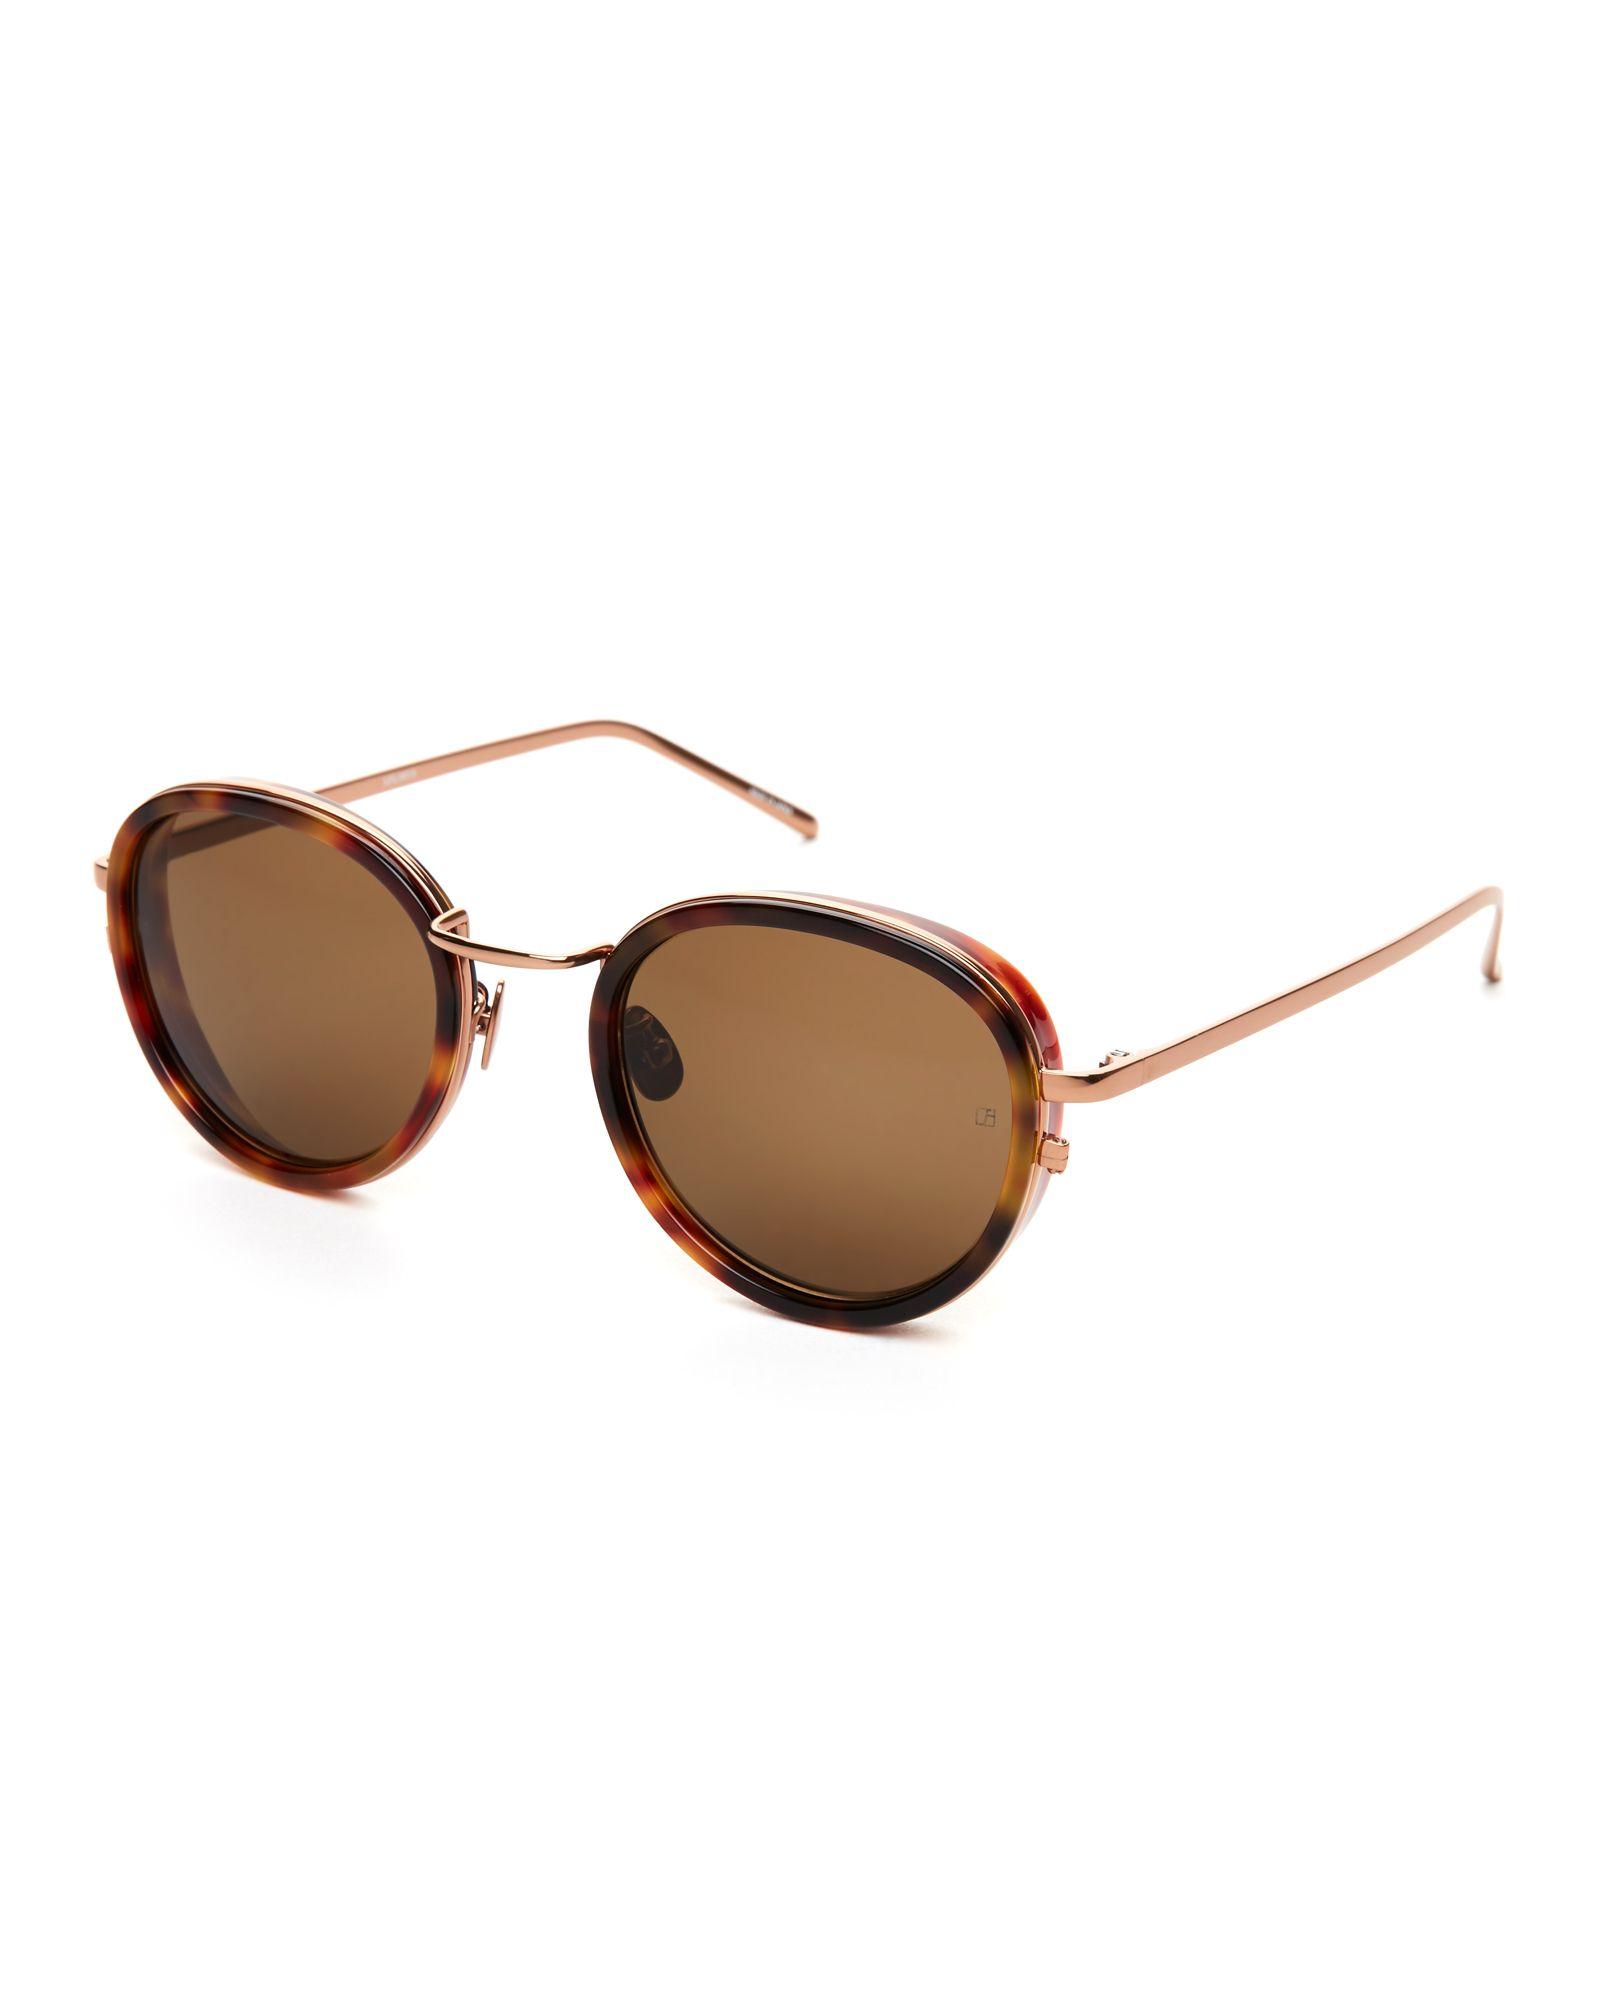 1df7305a3b Linda Farrow LFL 387 5 Tortoiseshell-Look Round Sunglasses ...